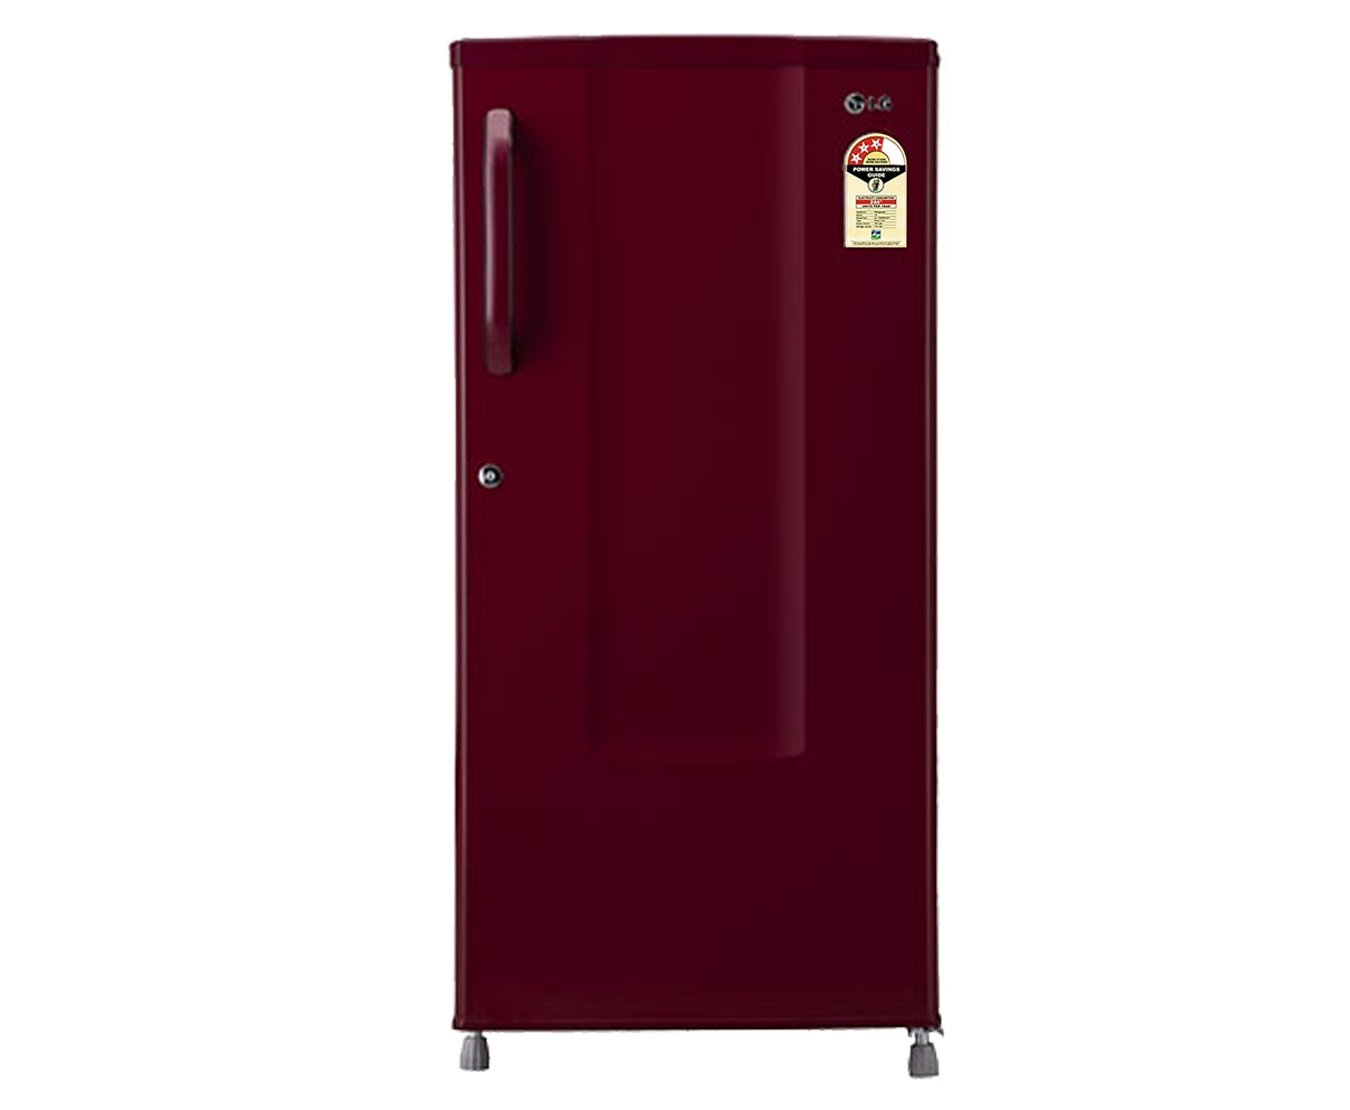 door com freezers on bhatbhatenionline doors ltr zoom single buy loading samsung refrigerator